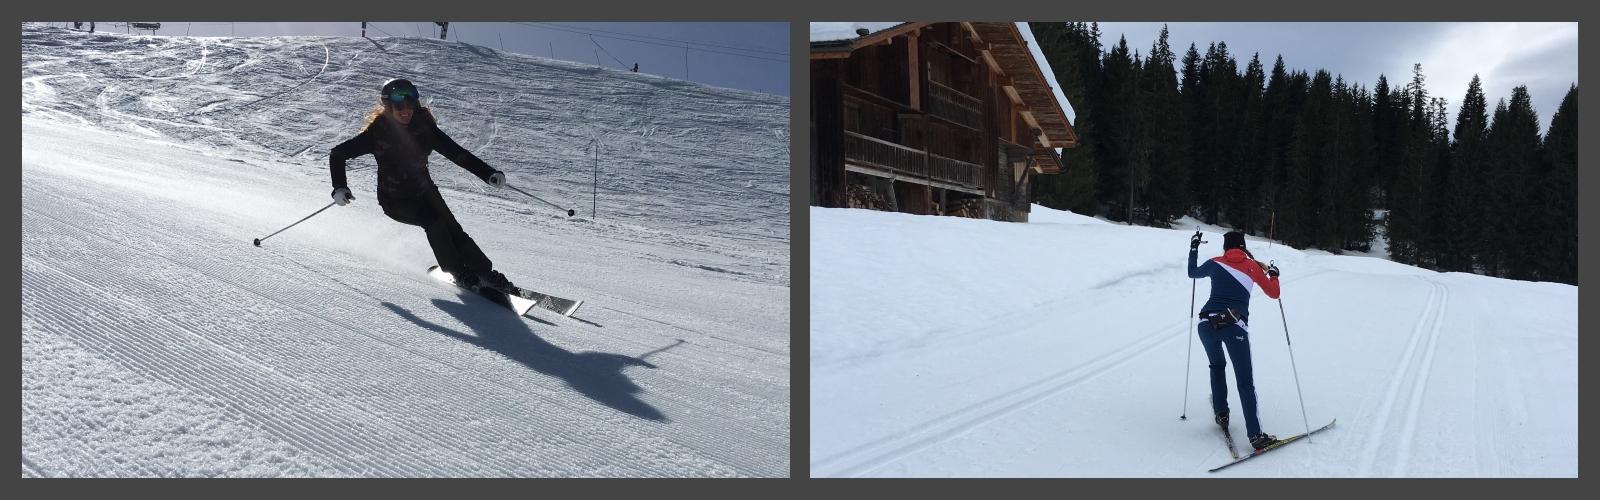 savoir-haute_savoie-isere-hautes_alpes-serre_chevalier-isola2000-auron-tignes-valdisere-lesdeuxalpes-alpedhuez-chamrousse-verbier-saasfee-gstaad-bessans-lessaisies-skieuses